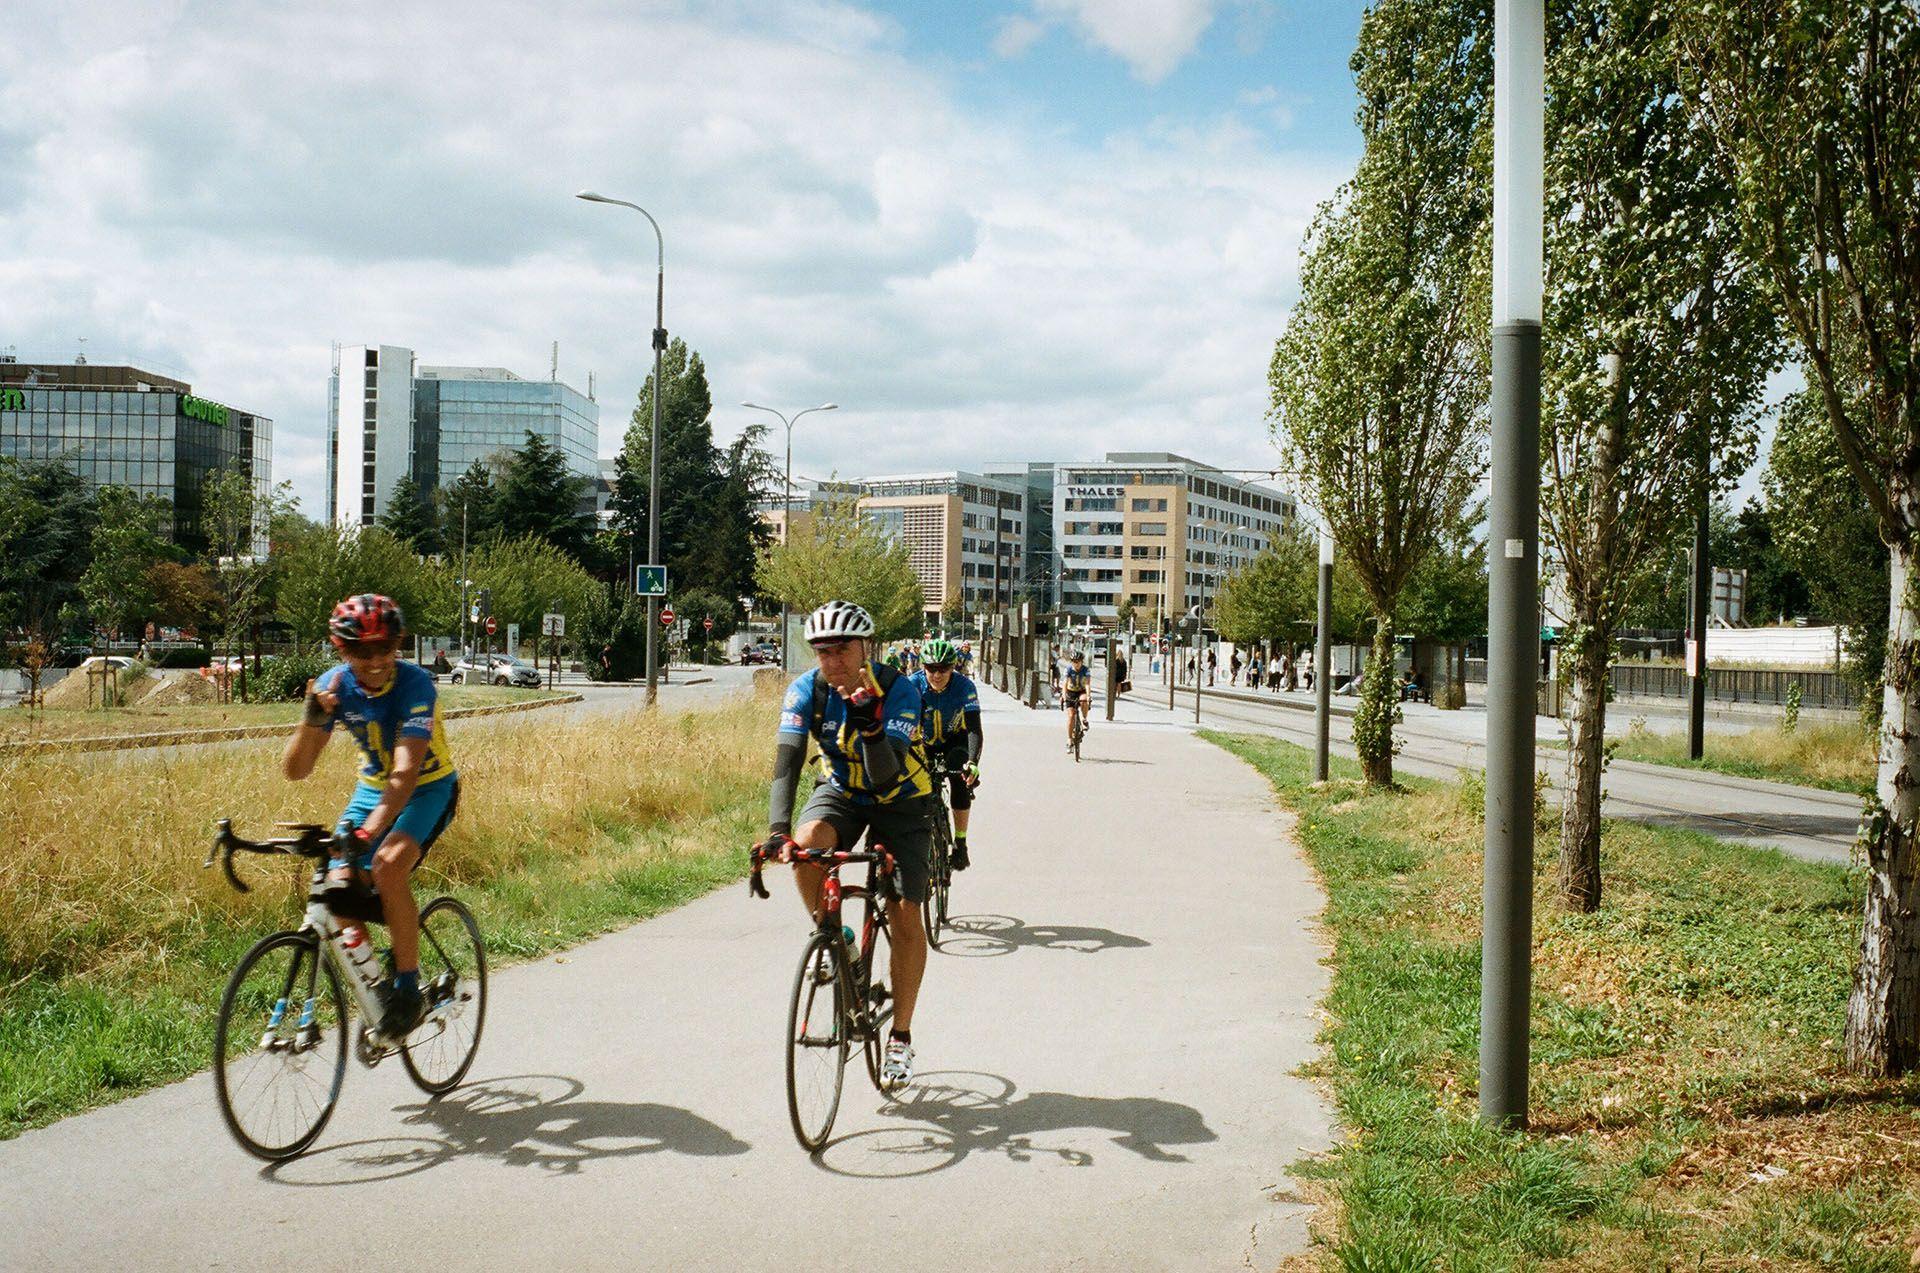 Вирушаємо на велопрогулянку Парижем